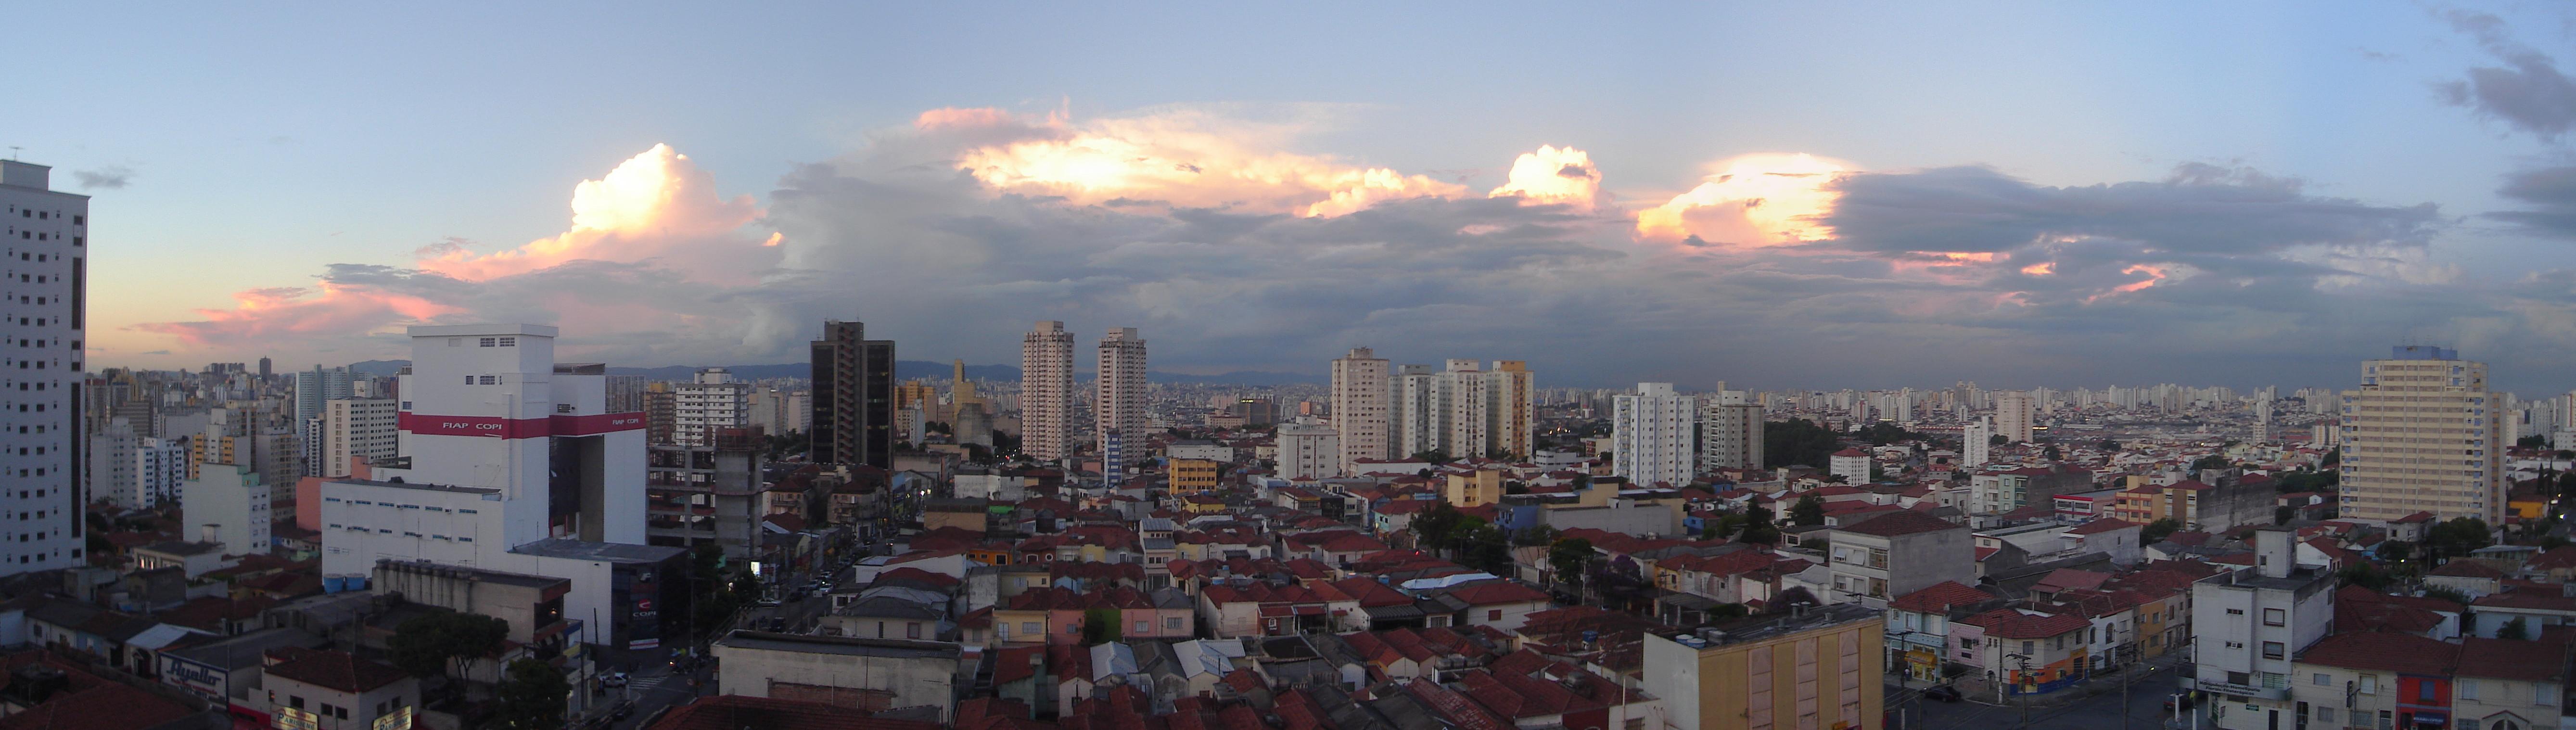 Panorama São Paulo fonte: upload.wikimedia.org